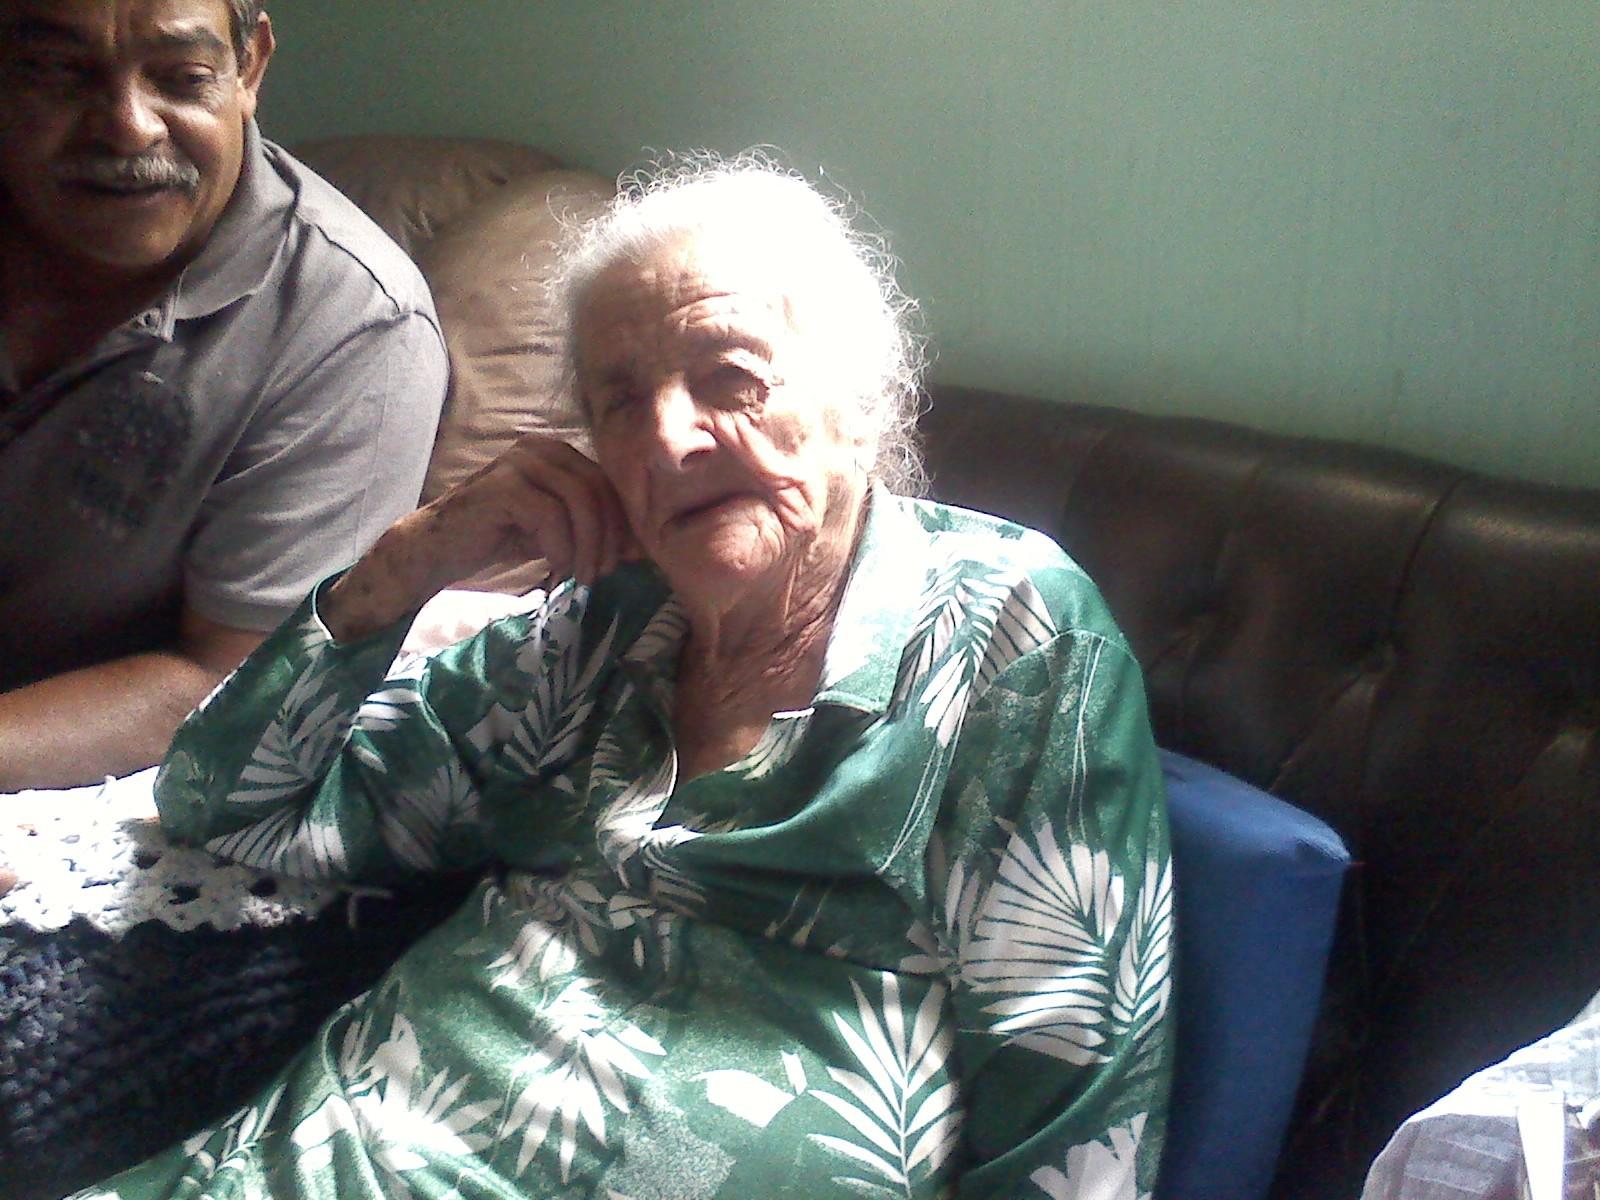 Maria Francisca Domingues, moradora de Itapetininga (SP), completou 103 anos neste domingo (20). (Foto: Carlos Alberto Soares / TV Tem)